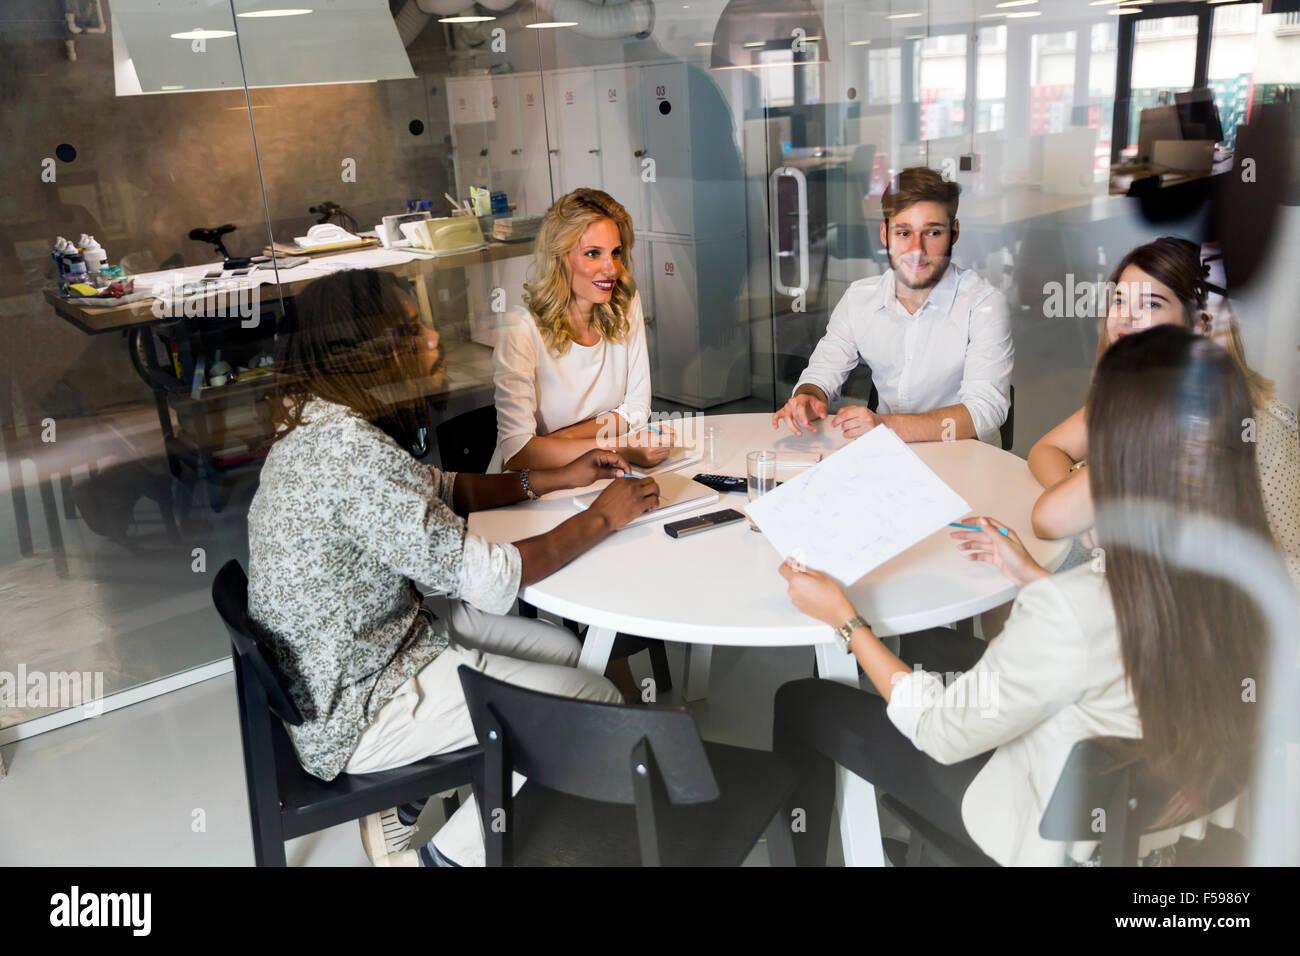 Reunión de negocios e intercambiar ideas en la bella oficina Imagen De Stock